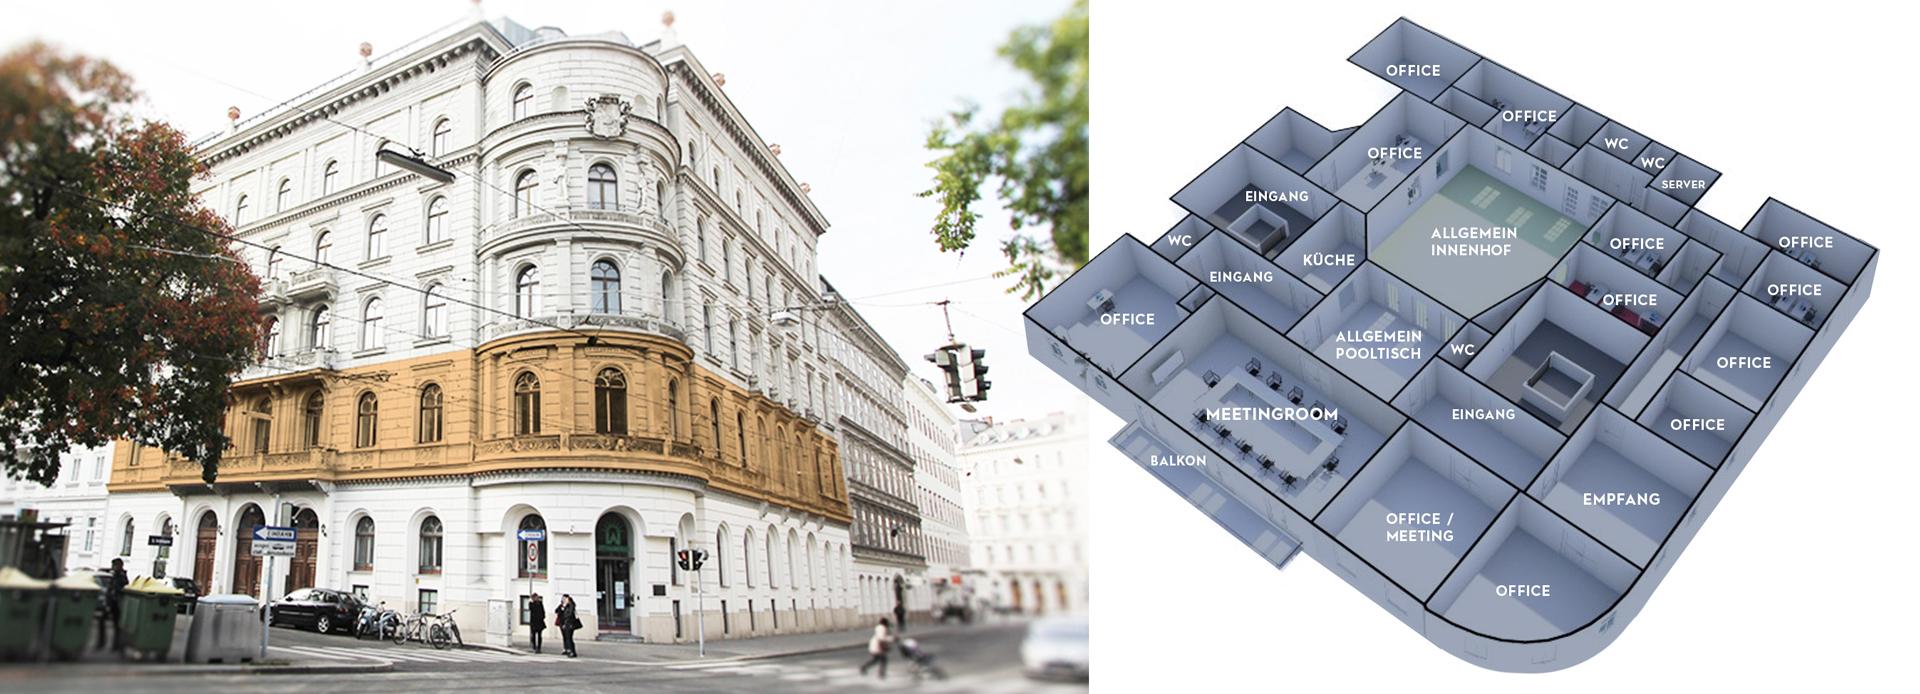 Palais Schlick: Repräsentative Büro-/ Ordinationsräume in zentraler Lage, Vienna